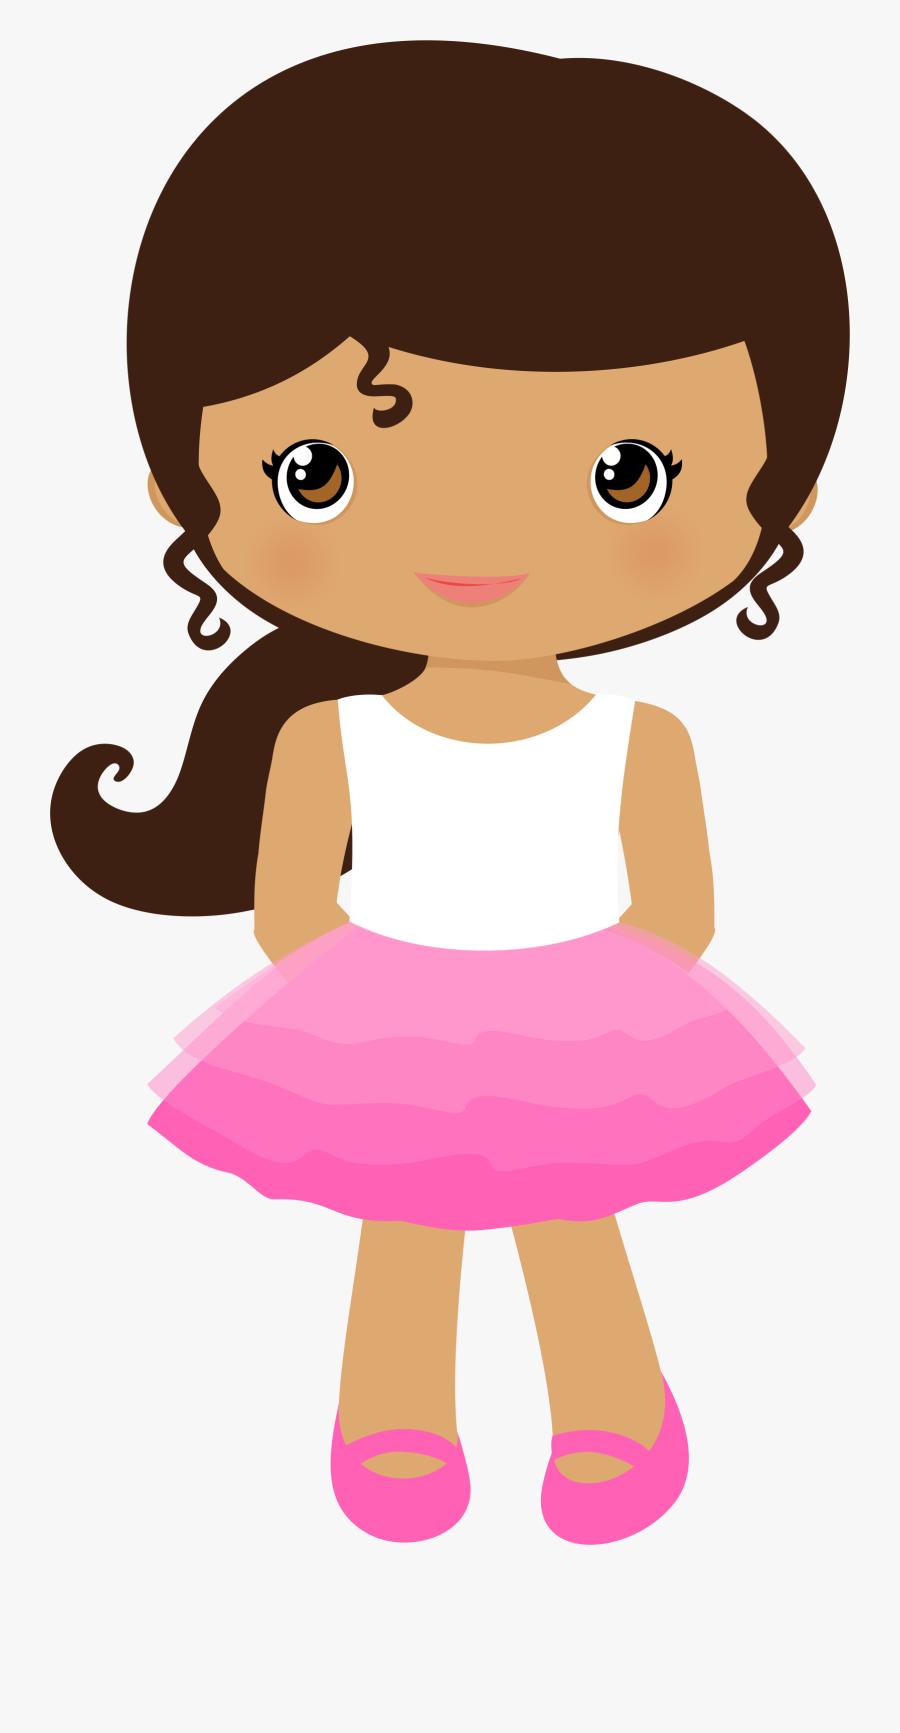 Cute Girl Clipart, Transparent Clipart